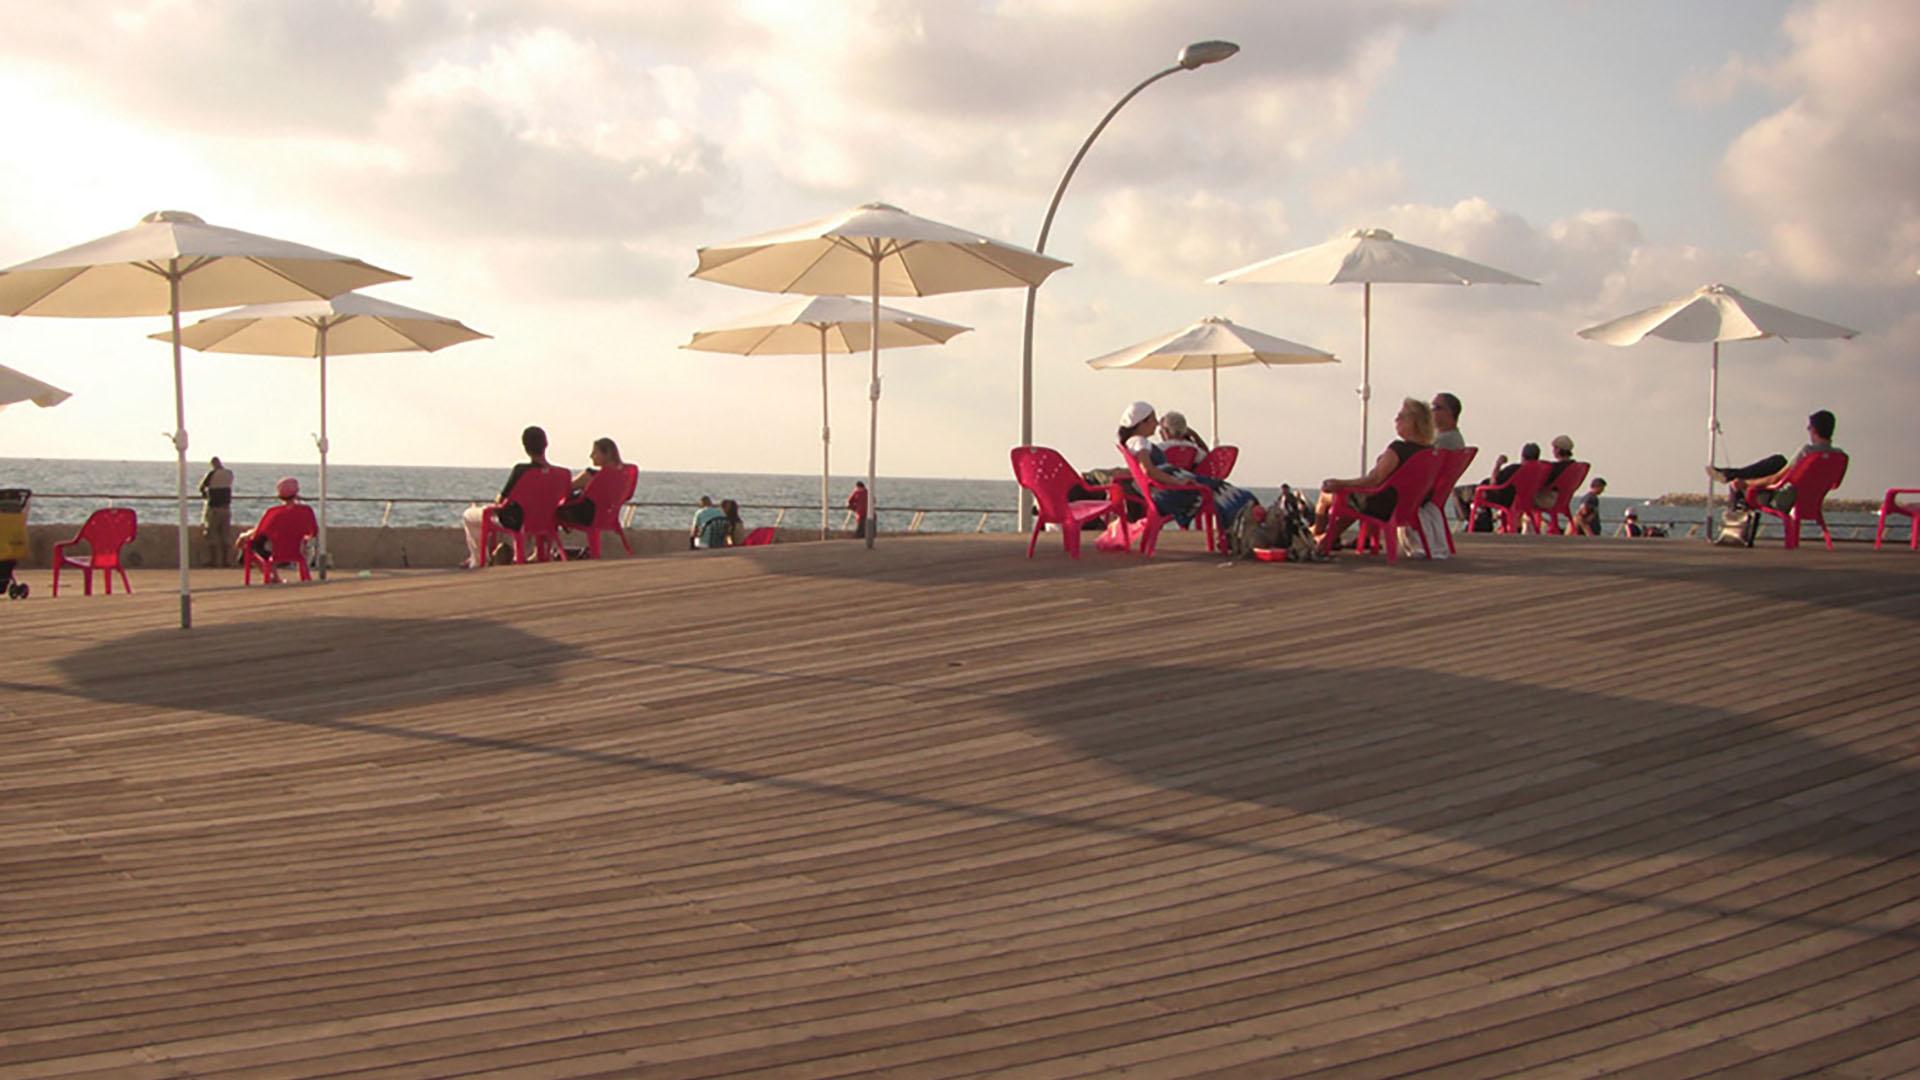 09 - Tel-Aviv-Port-Public-Space-Regeneration-Mayslits-Kassif-Architects-03